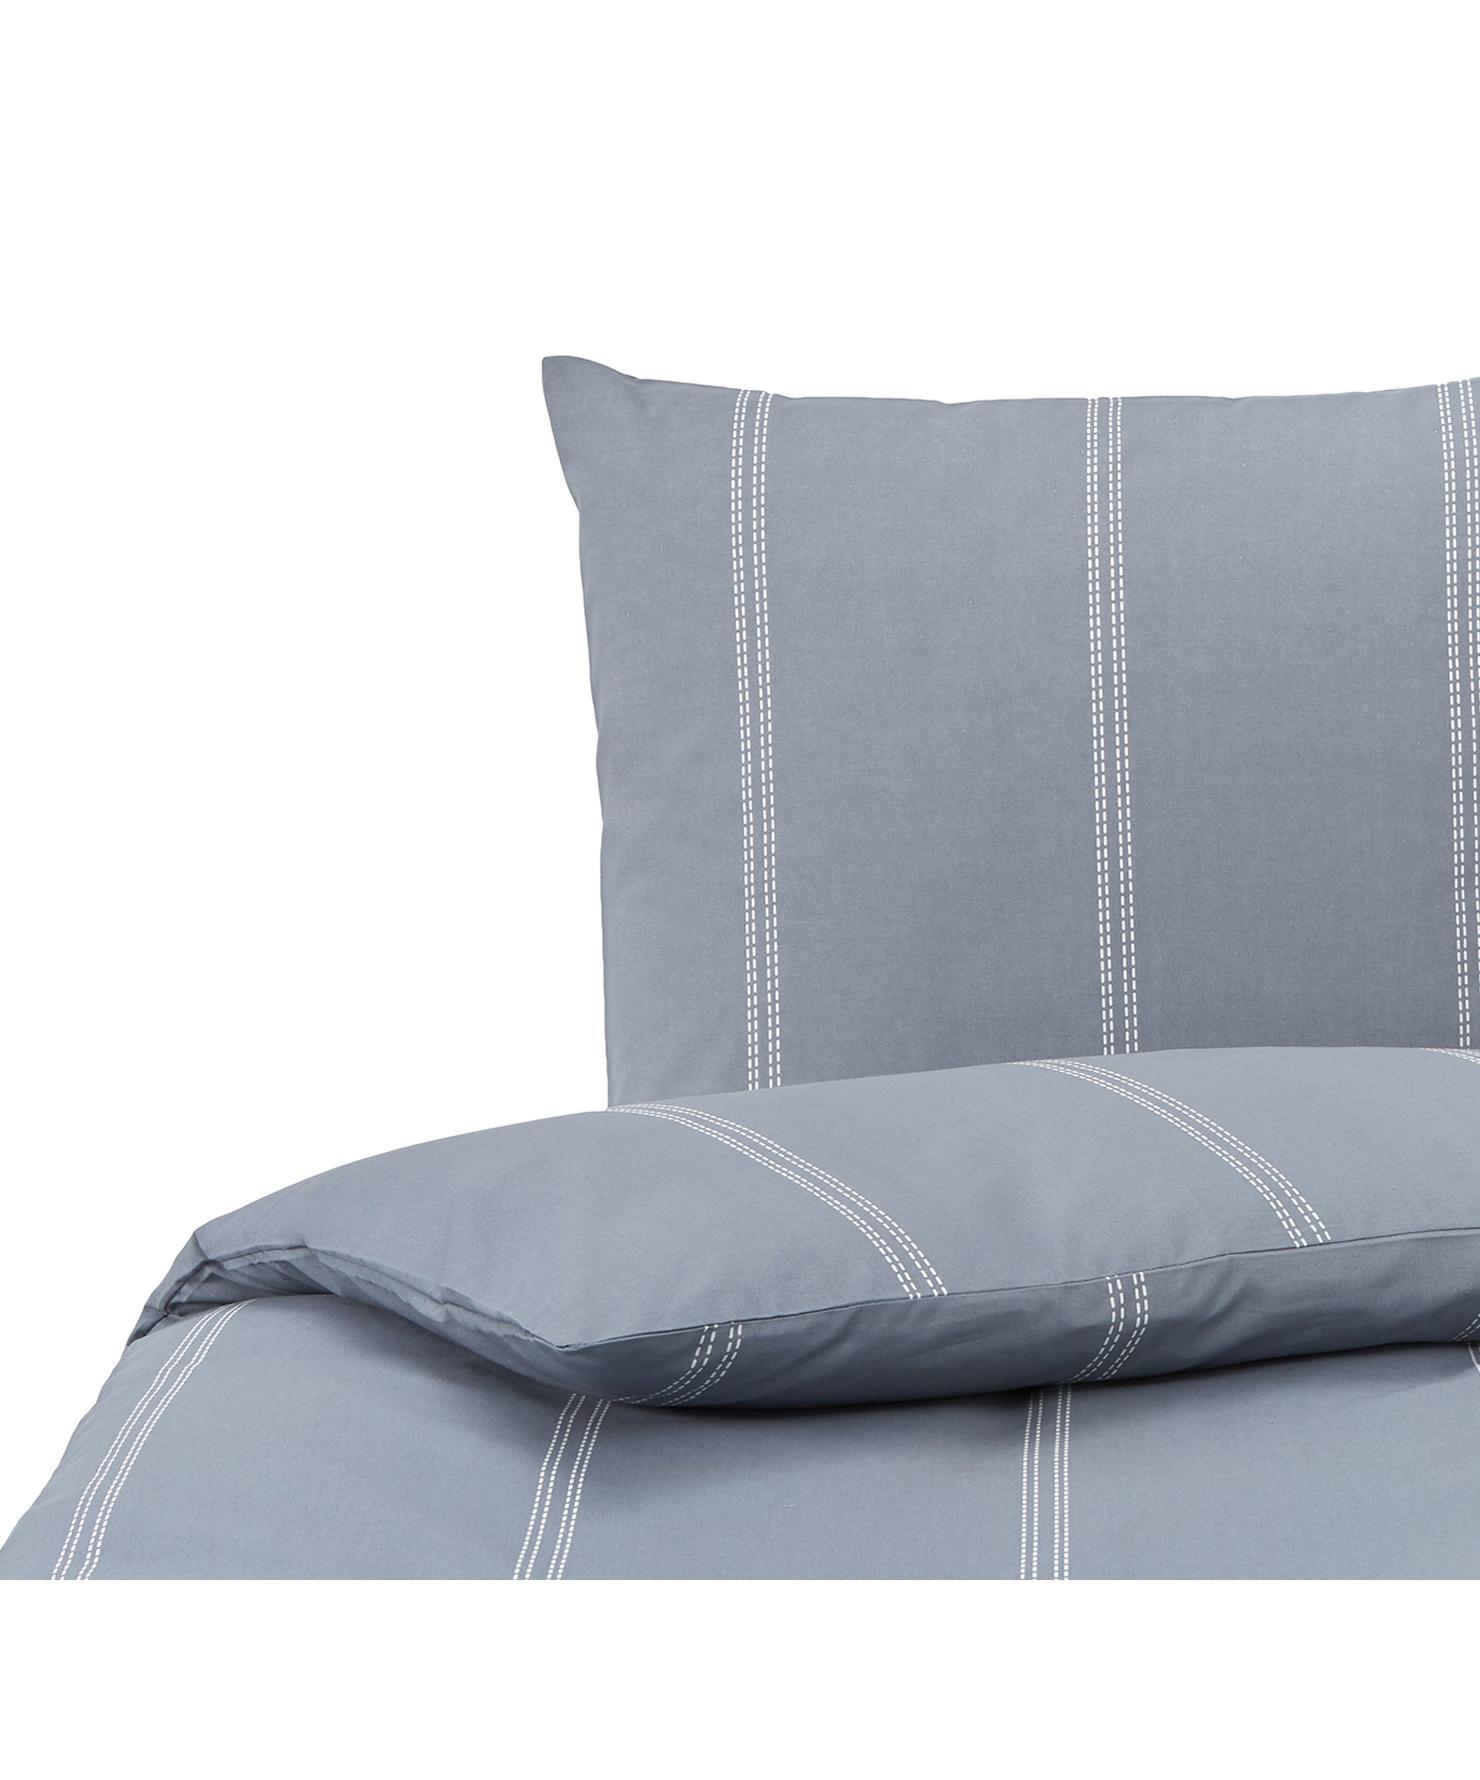 Dekbedovertrek Remade, 52% gerecycled polyester, 48% gerecycled katoen, Blauw, wit, 140 x 220 cm